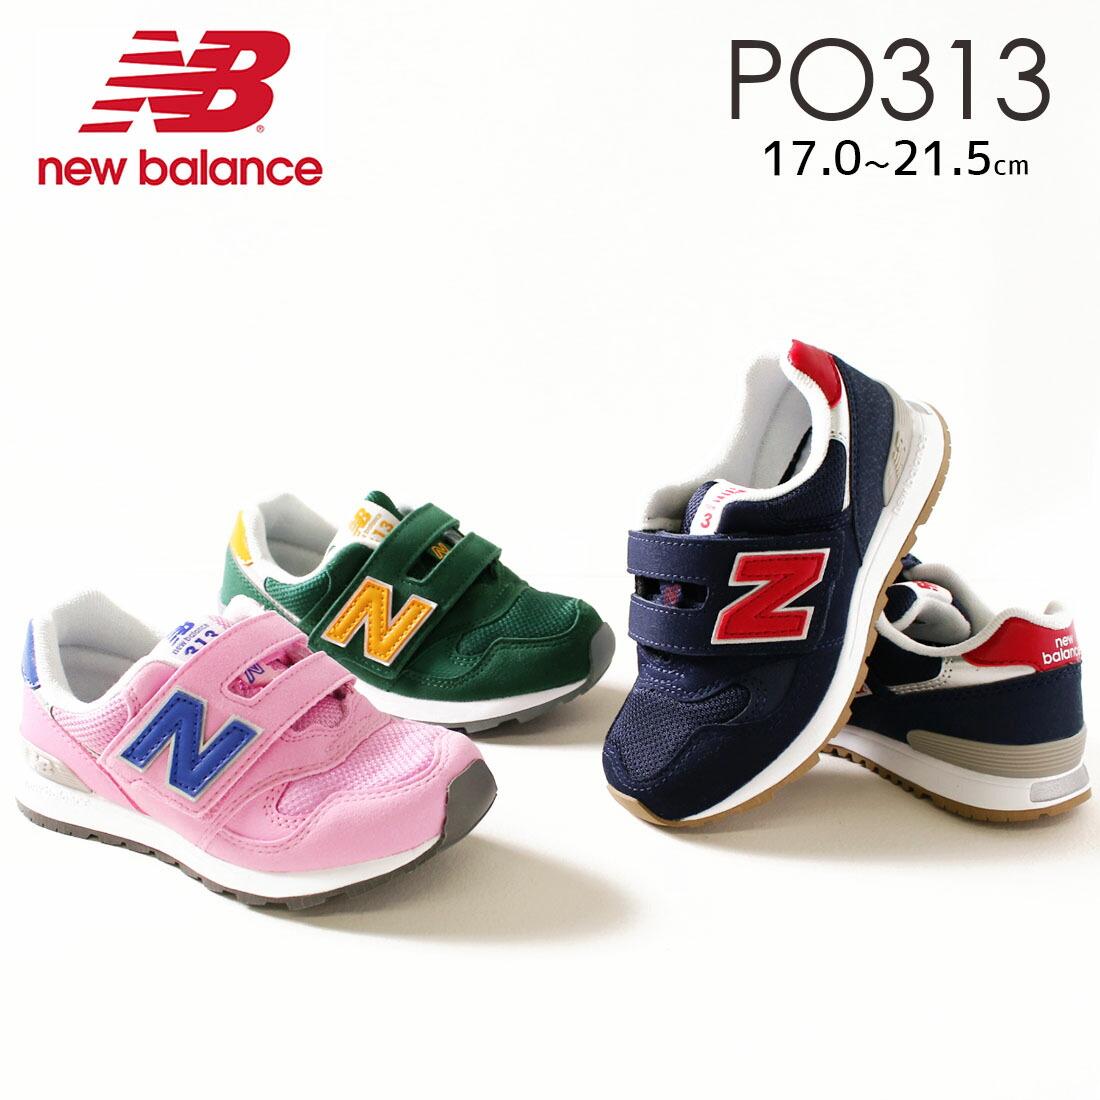 new balance po313